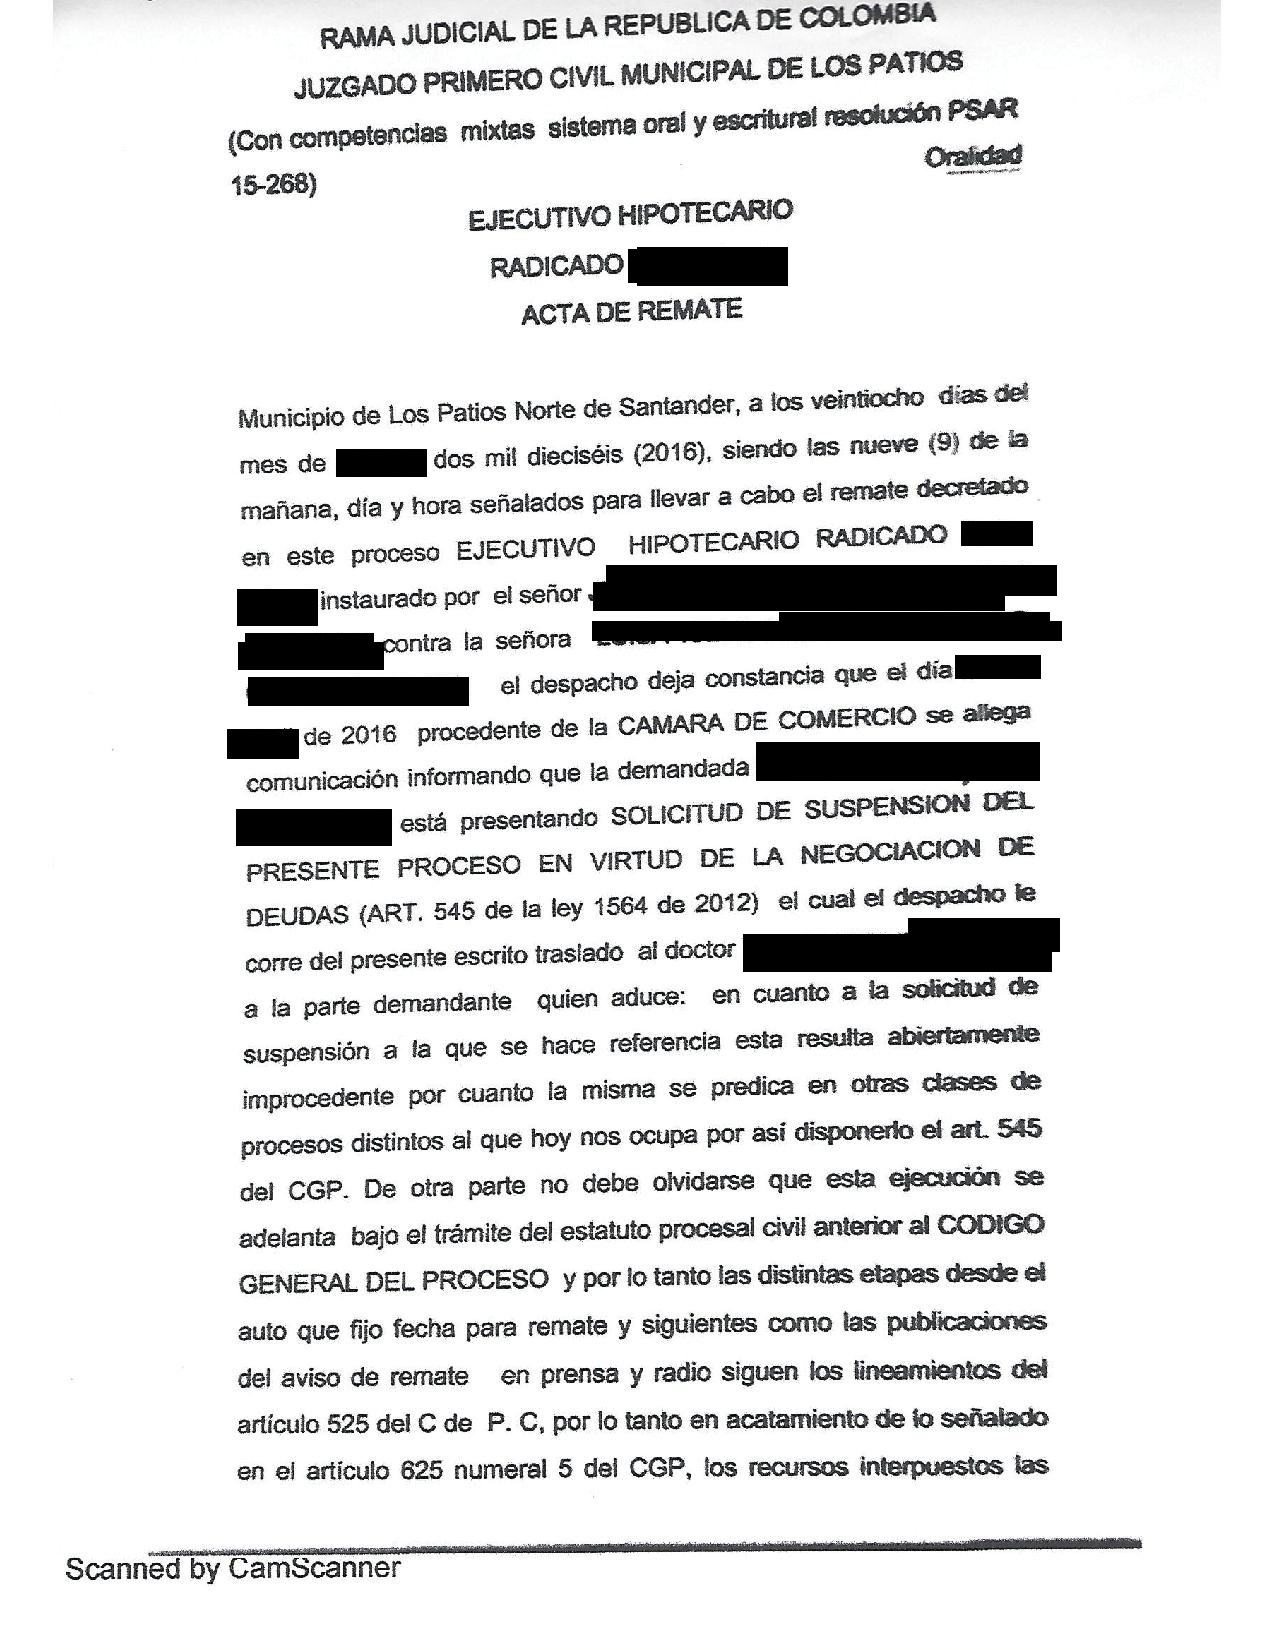 Remate de Luisa Isela Buendia Zambrano (1)1